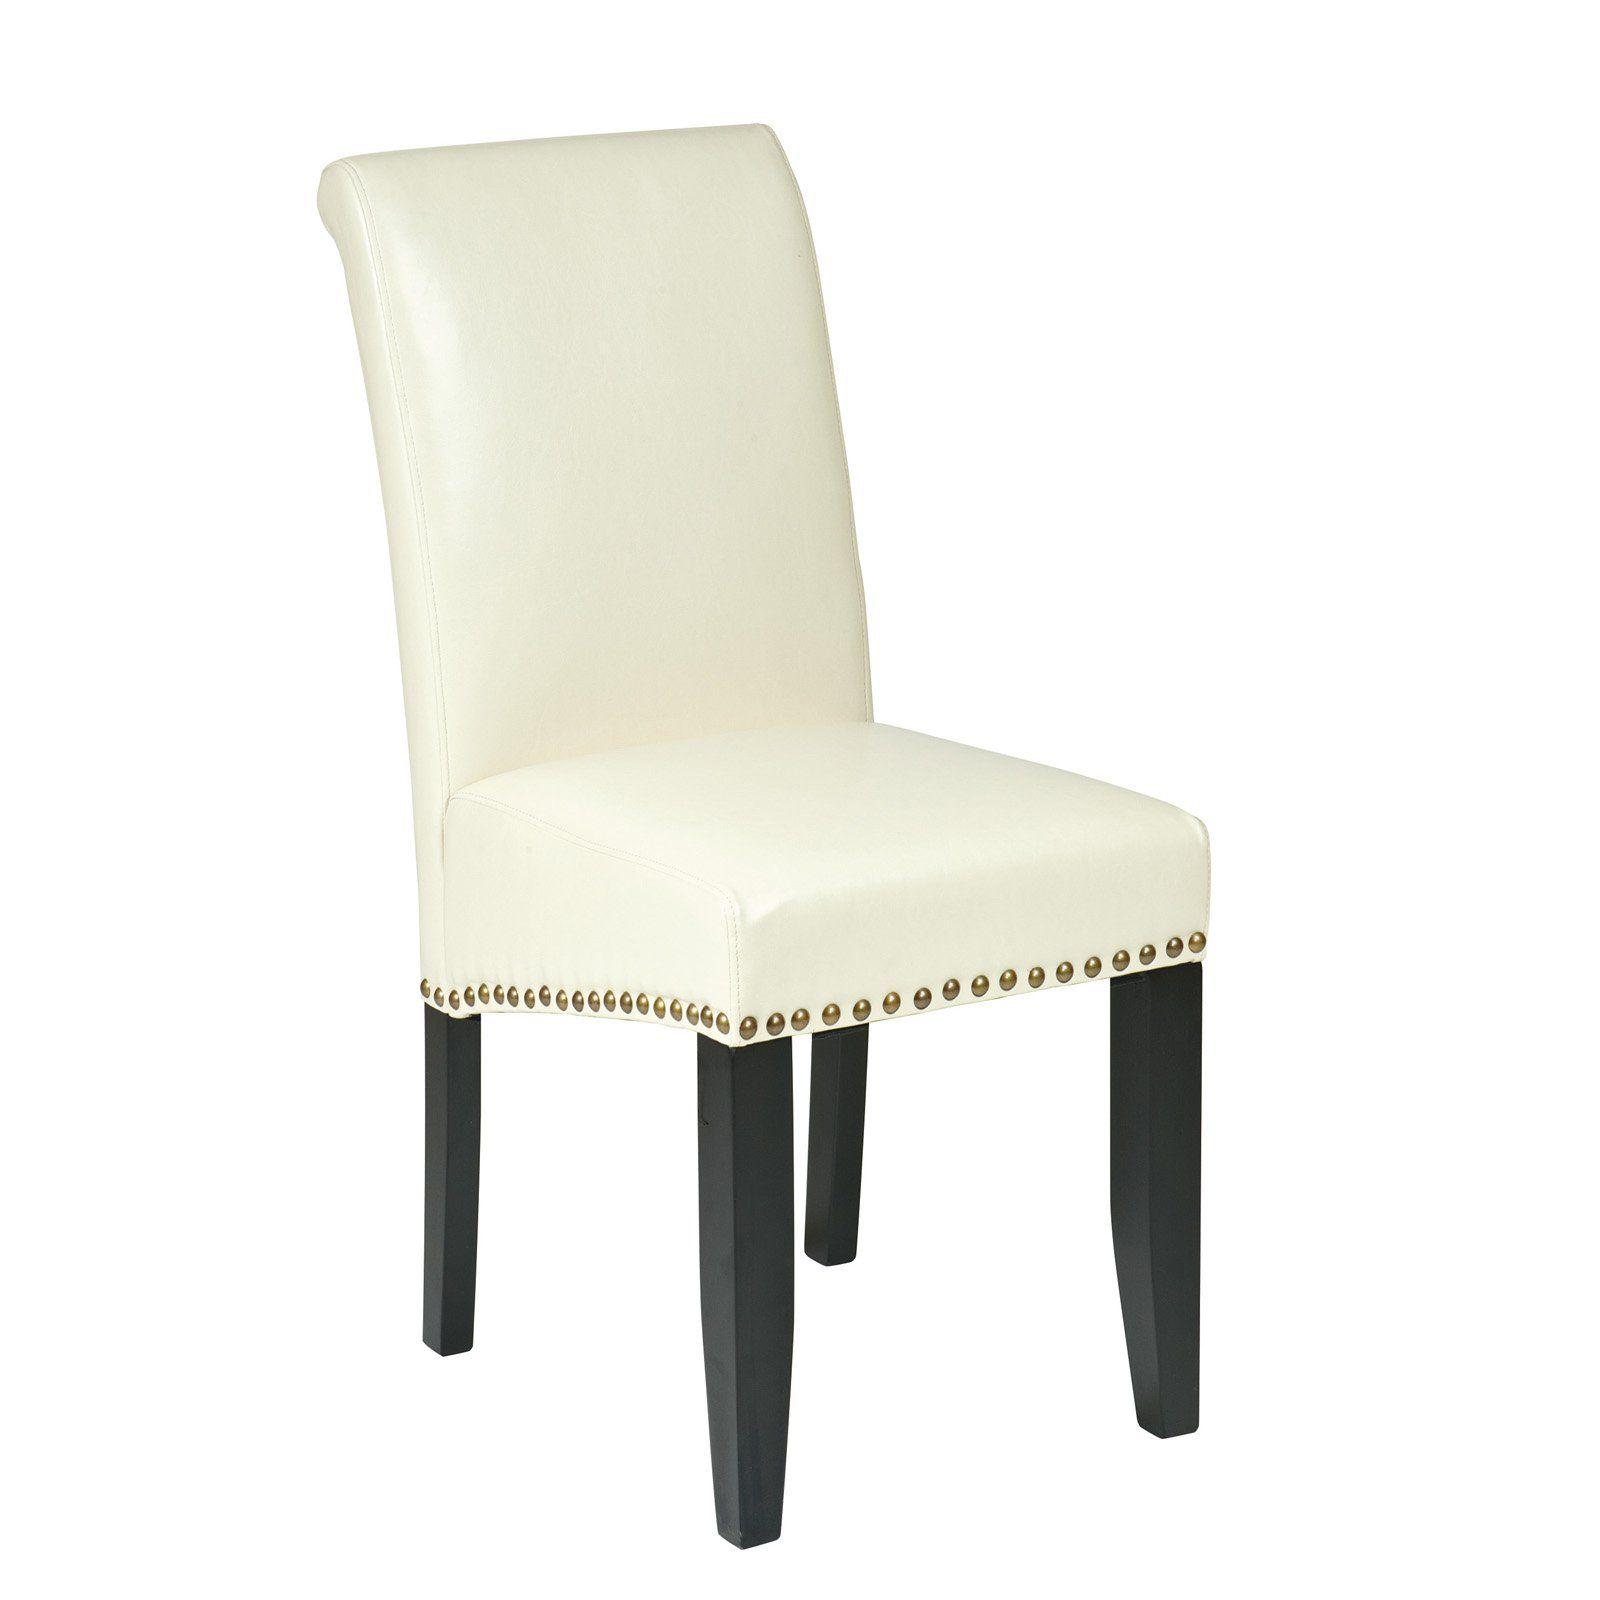 Osp Designs Metro Parsons Nailhead Dining Chair Cream In